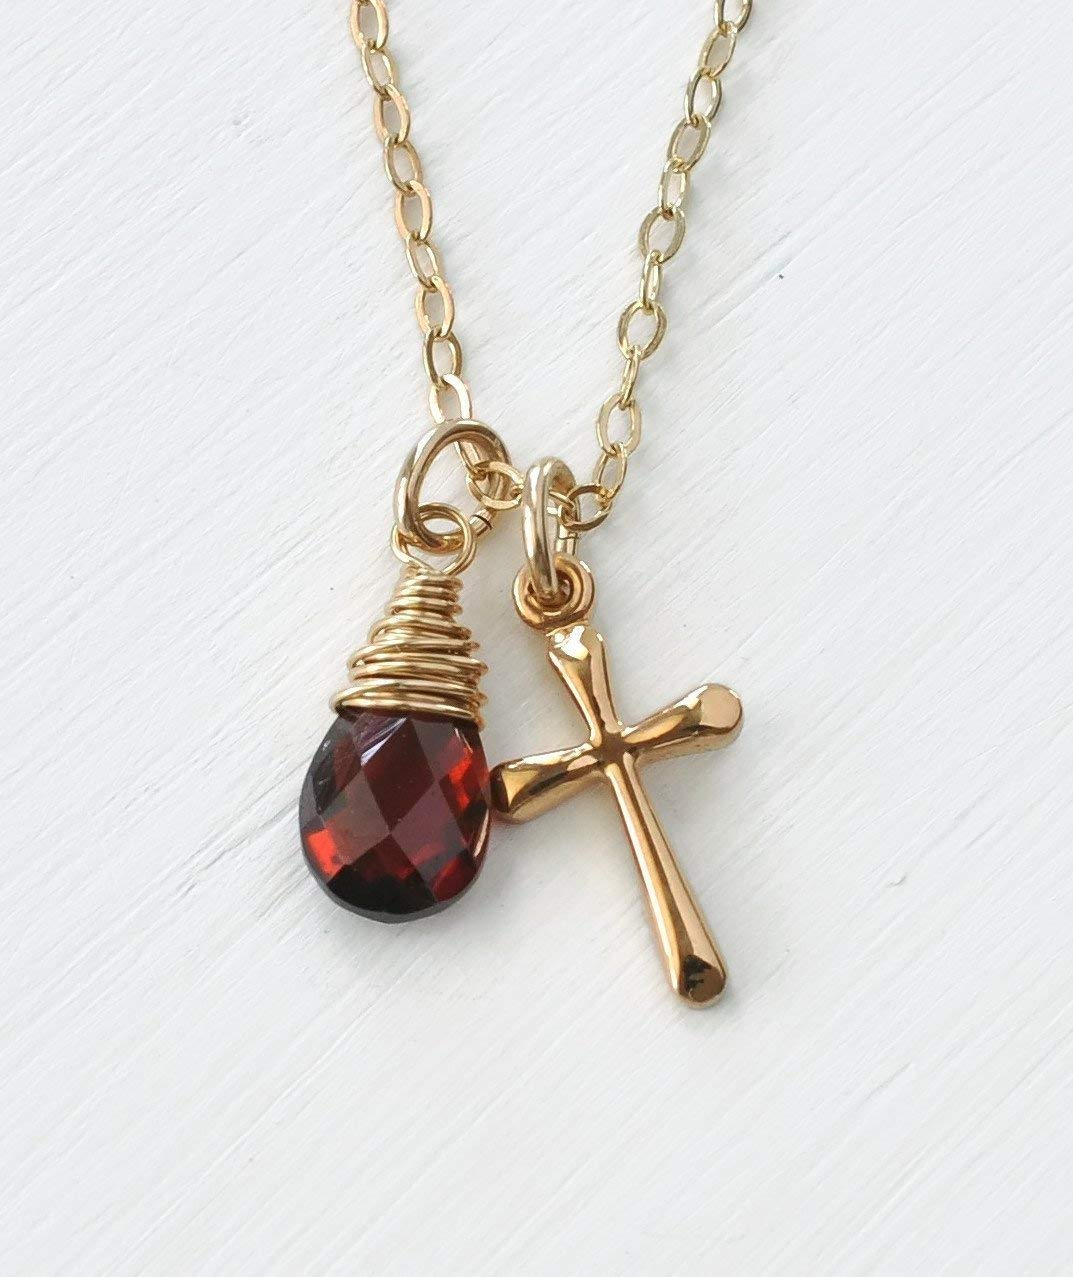 Lux Accessories Garnet Siam January Birthstone Pendant Disc Pave Charm Pendant